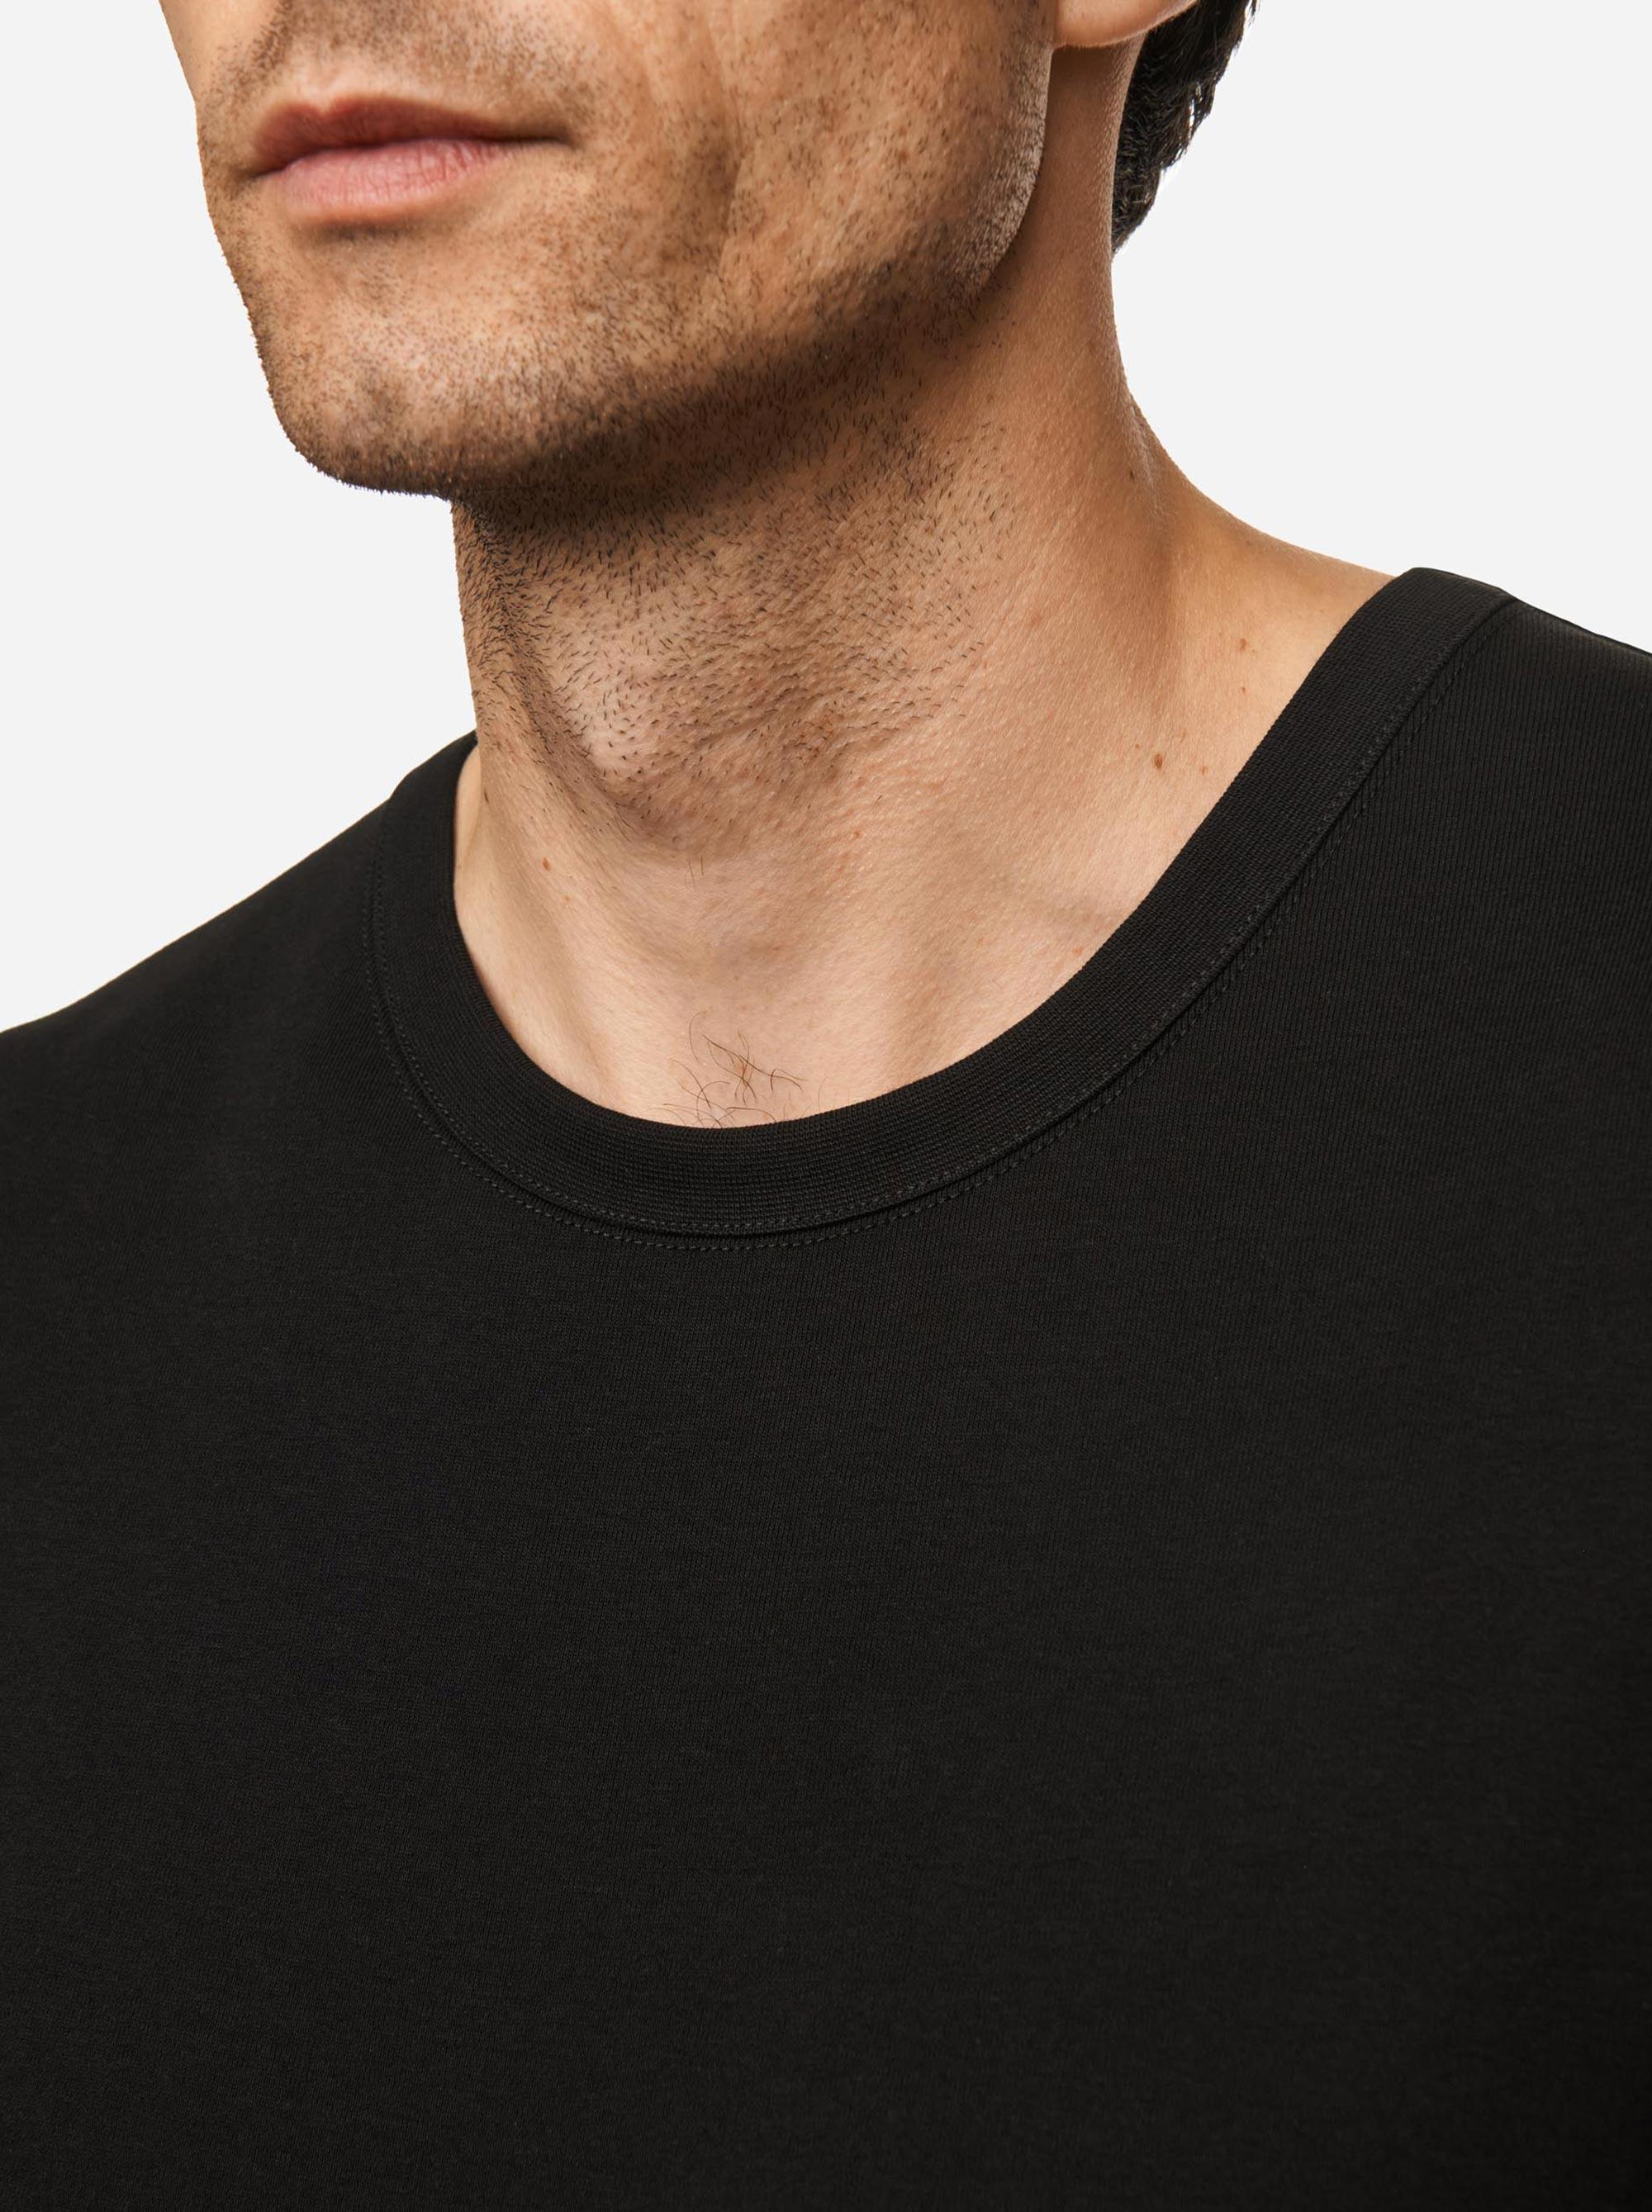 Teym - The-T-Shirt - Longsleeve - Men - Black - 3